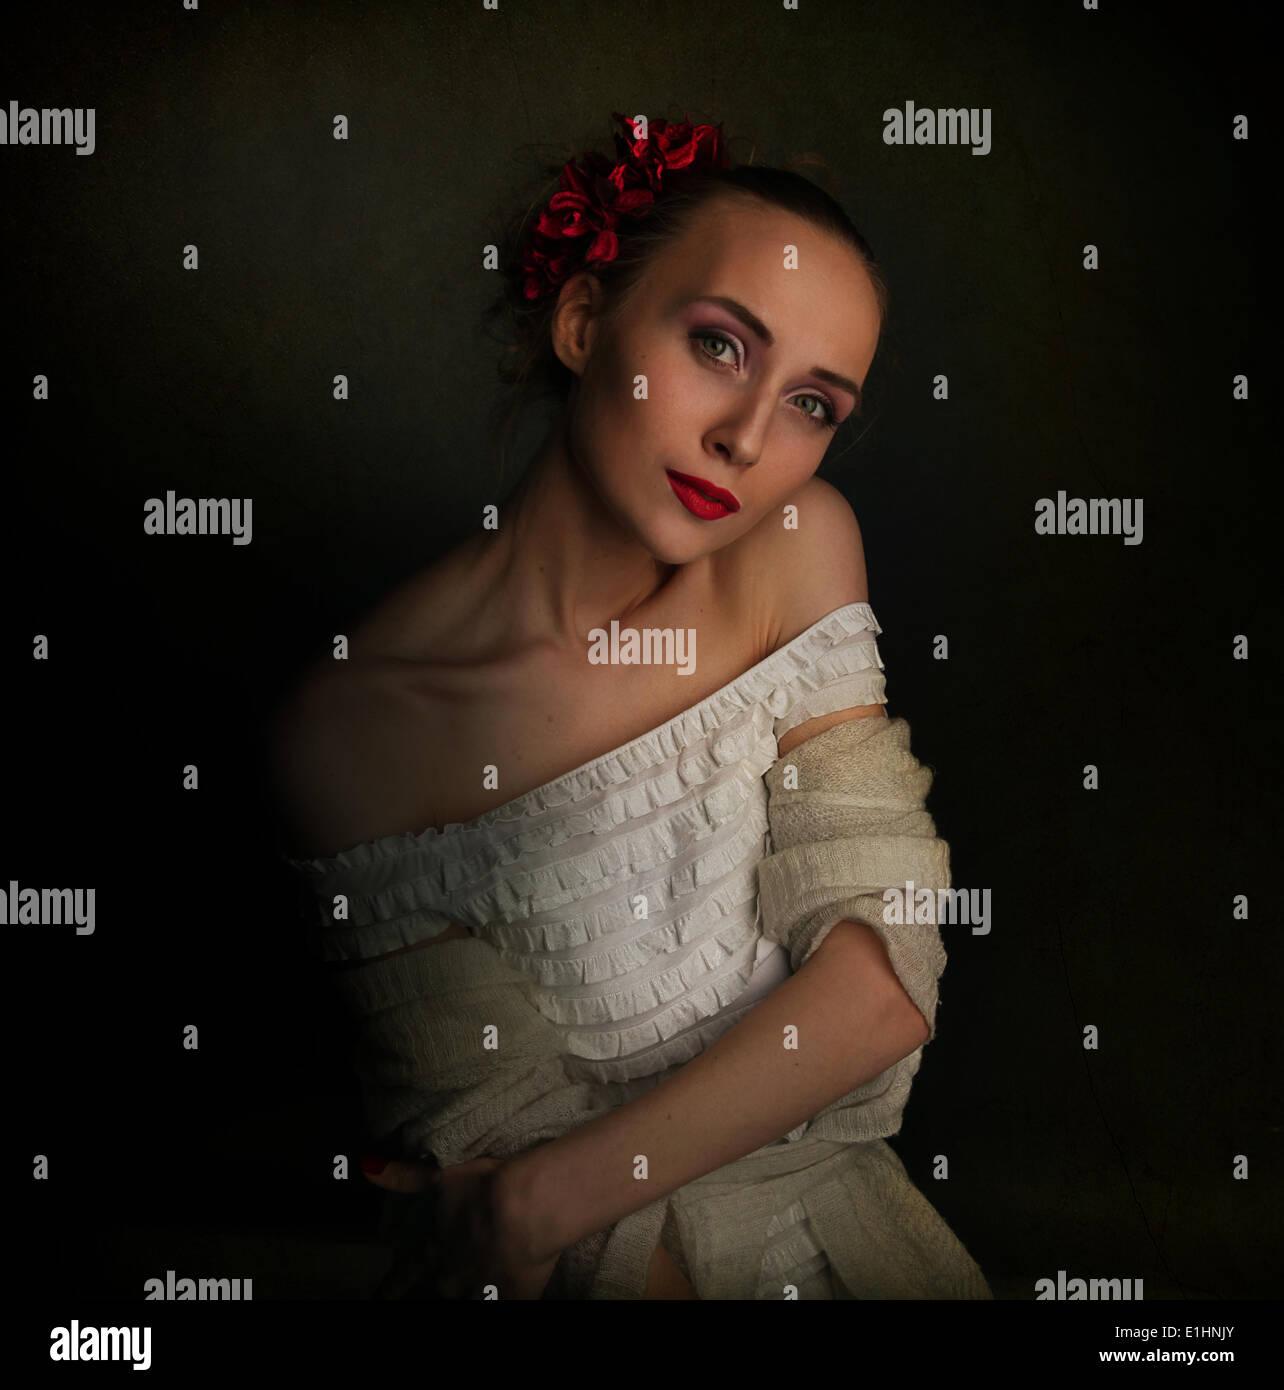 Retro vintage stile - giovane donna in epoca medievale i vestiti Immagini Stock